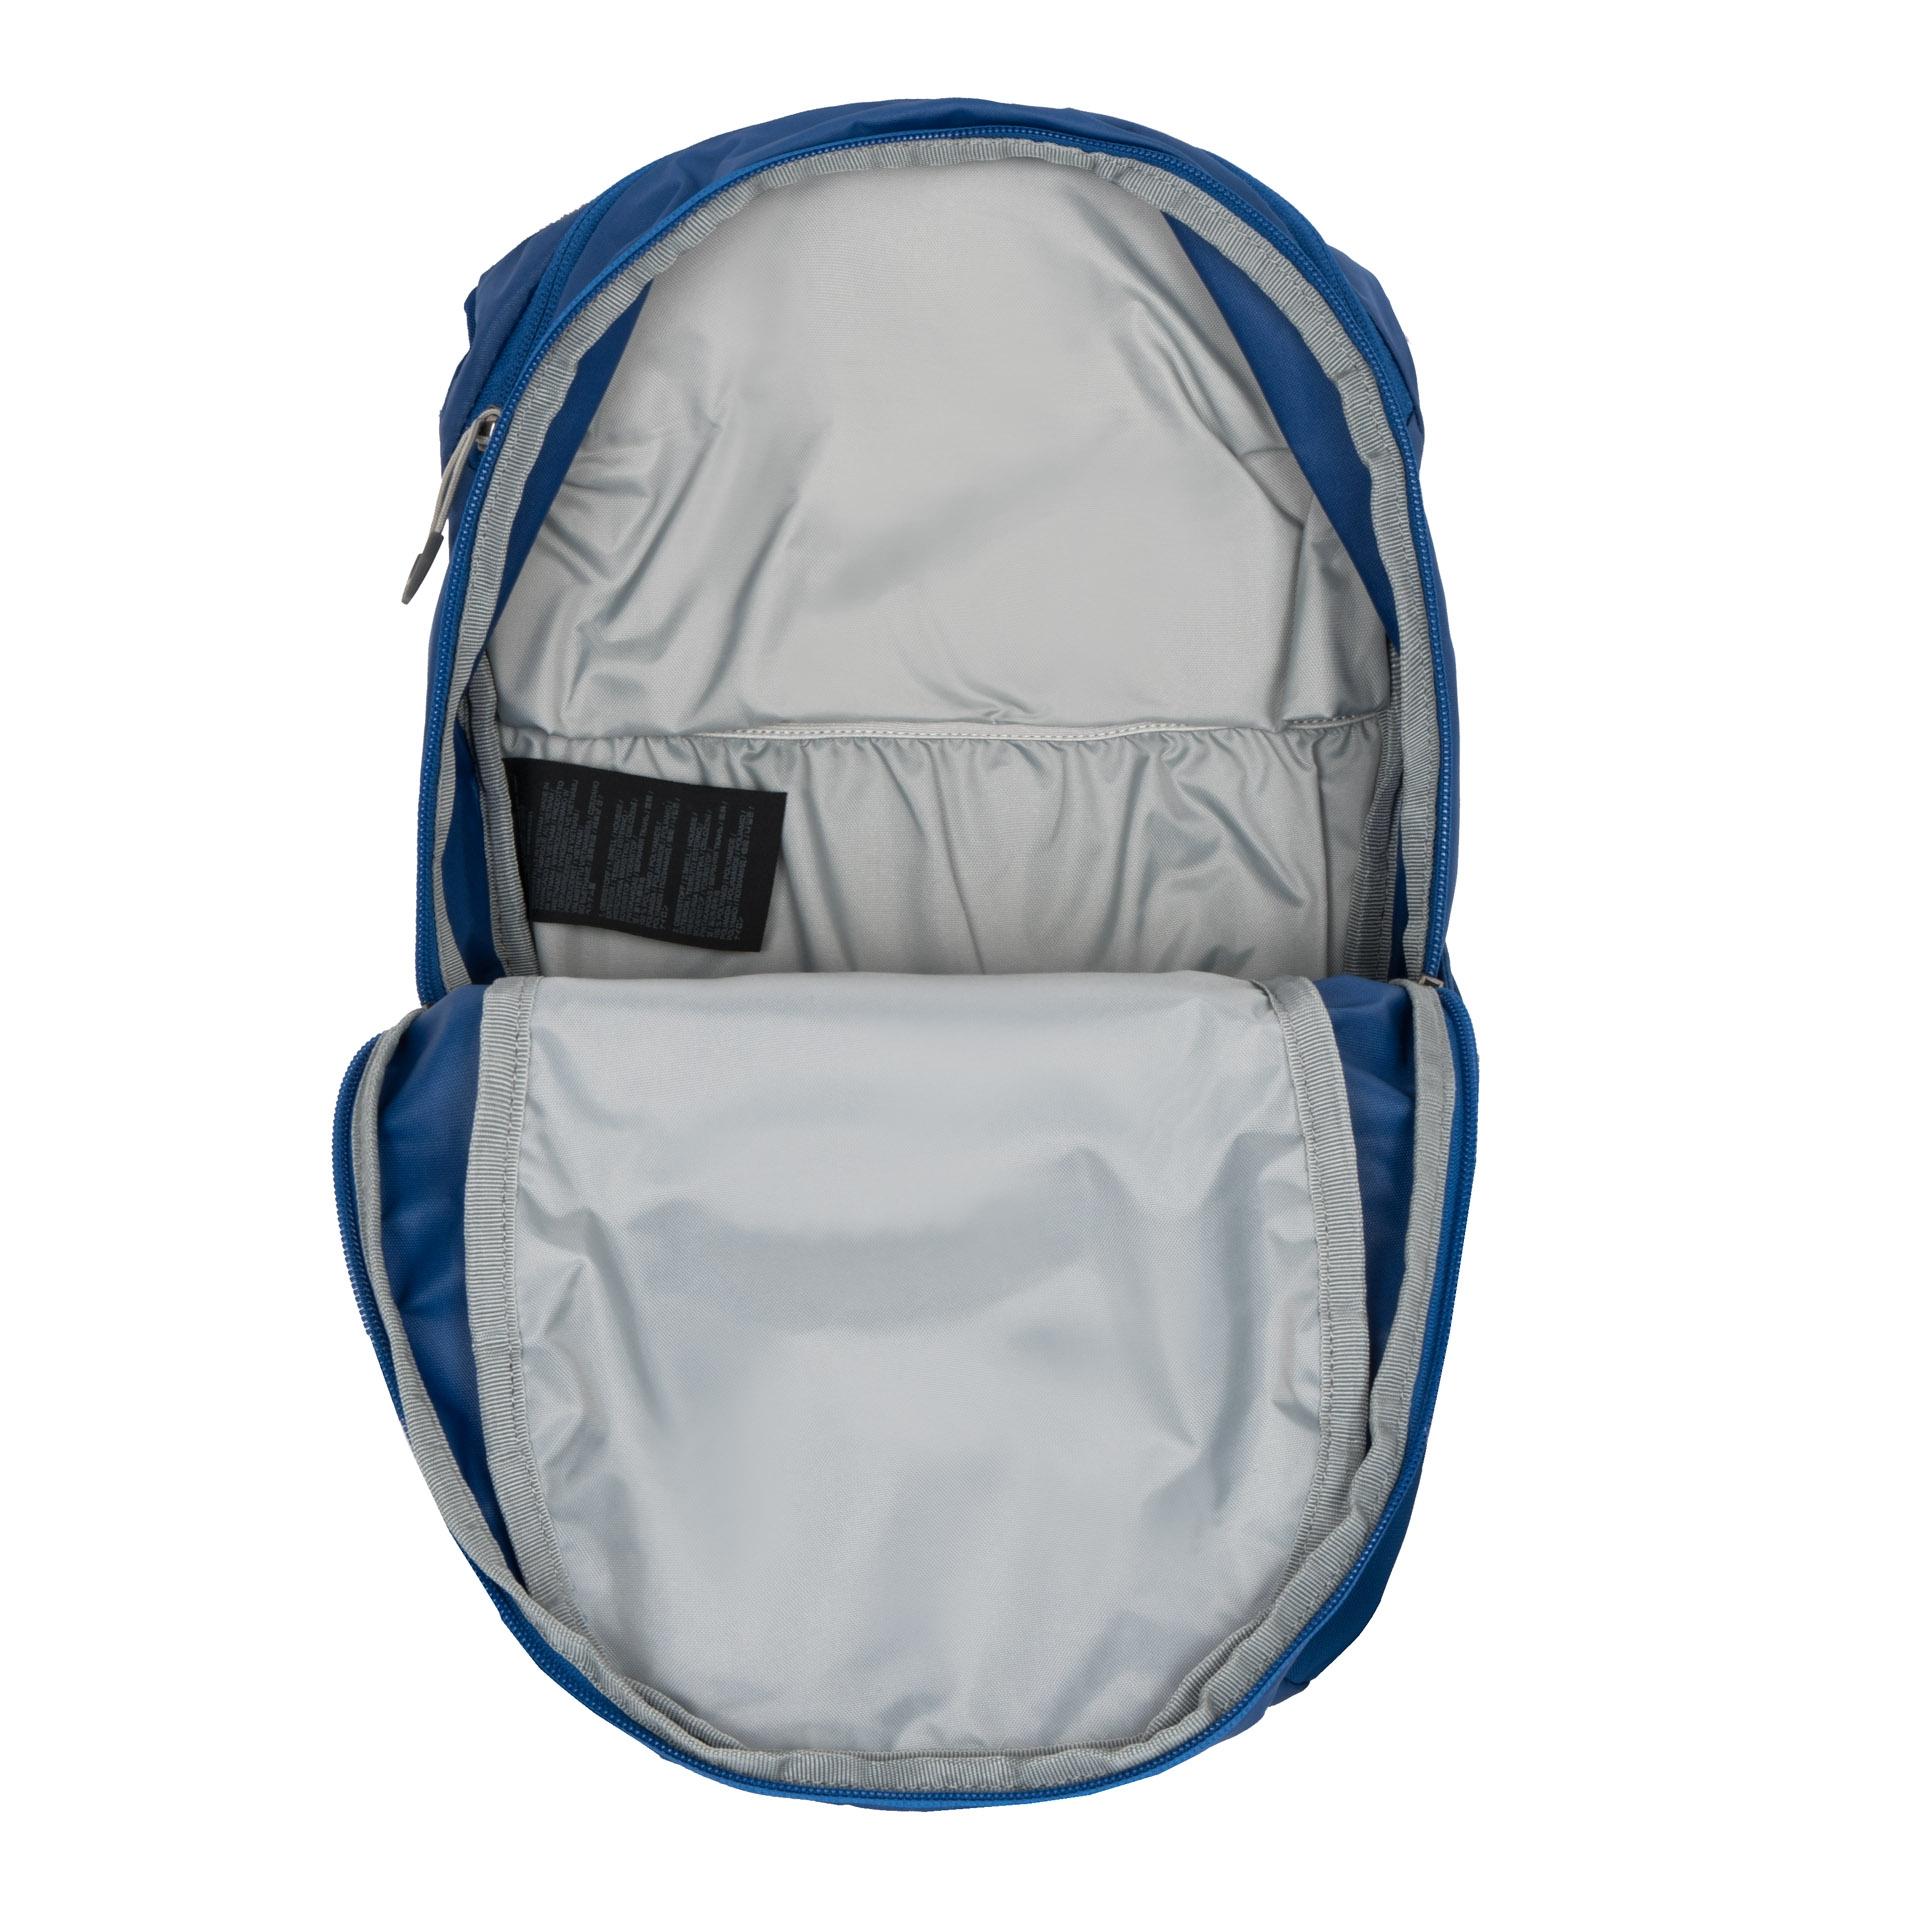 Jack Wolfskin Kids Akka Pack Royal blue Športový batoh ideálny na skateboard či snowboard je vhodný pre deti od 6 rokov.